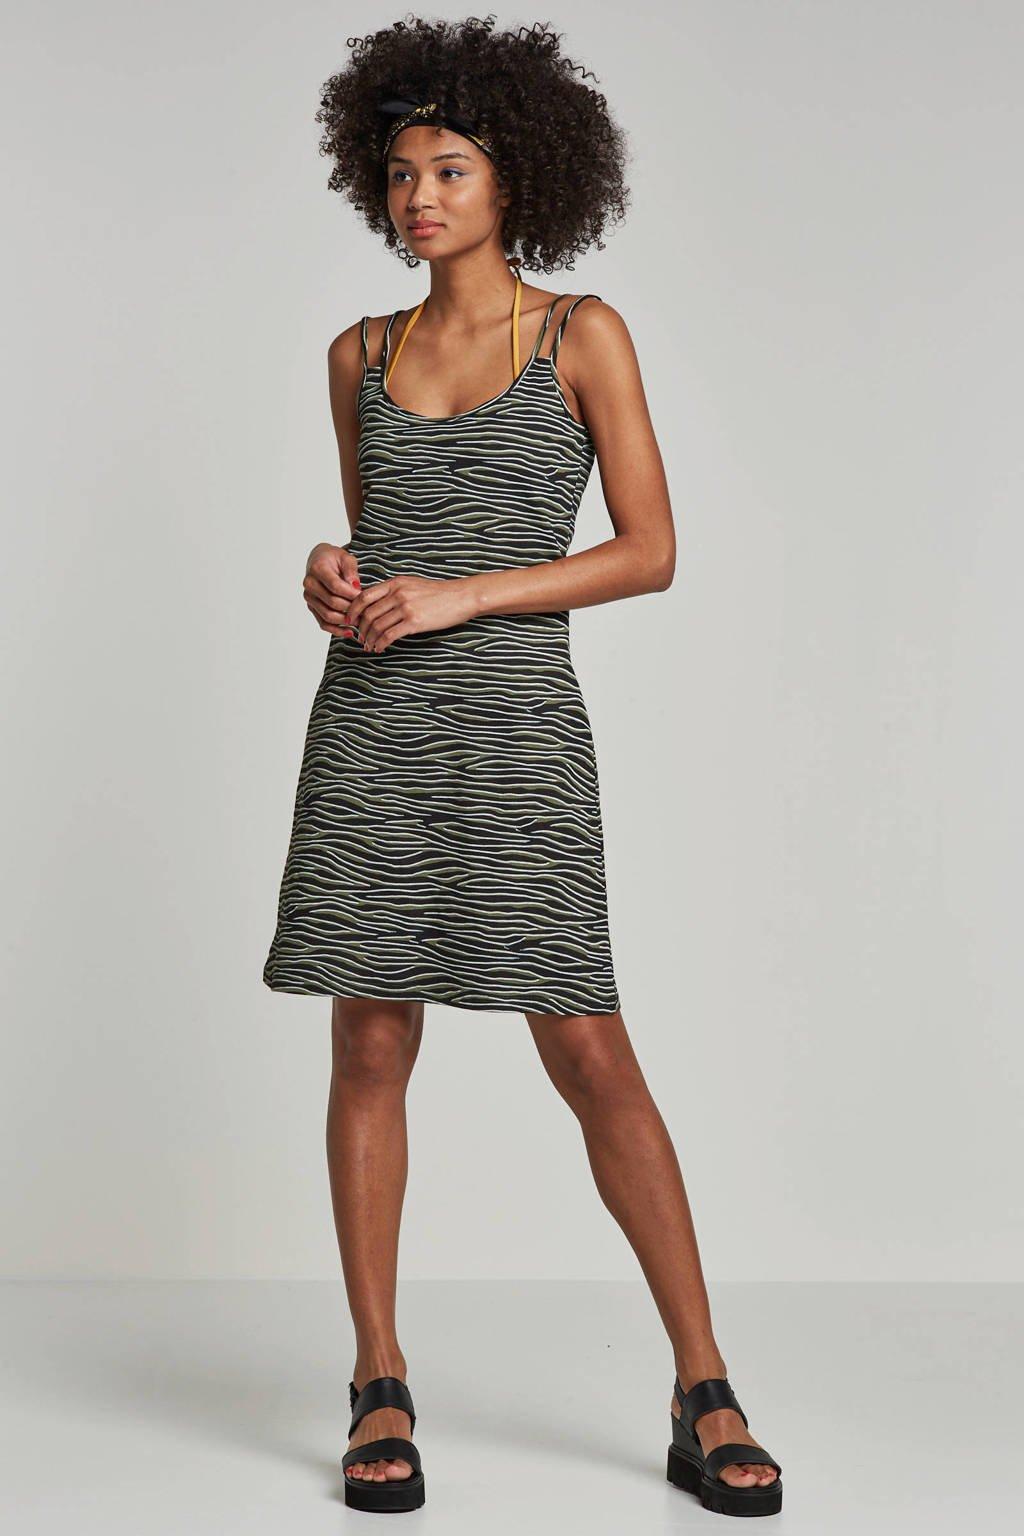 whkmp's beachwave jurk (set van 2), Zwart/groen